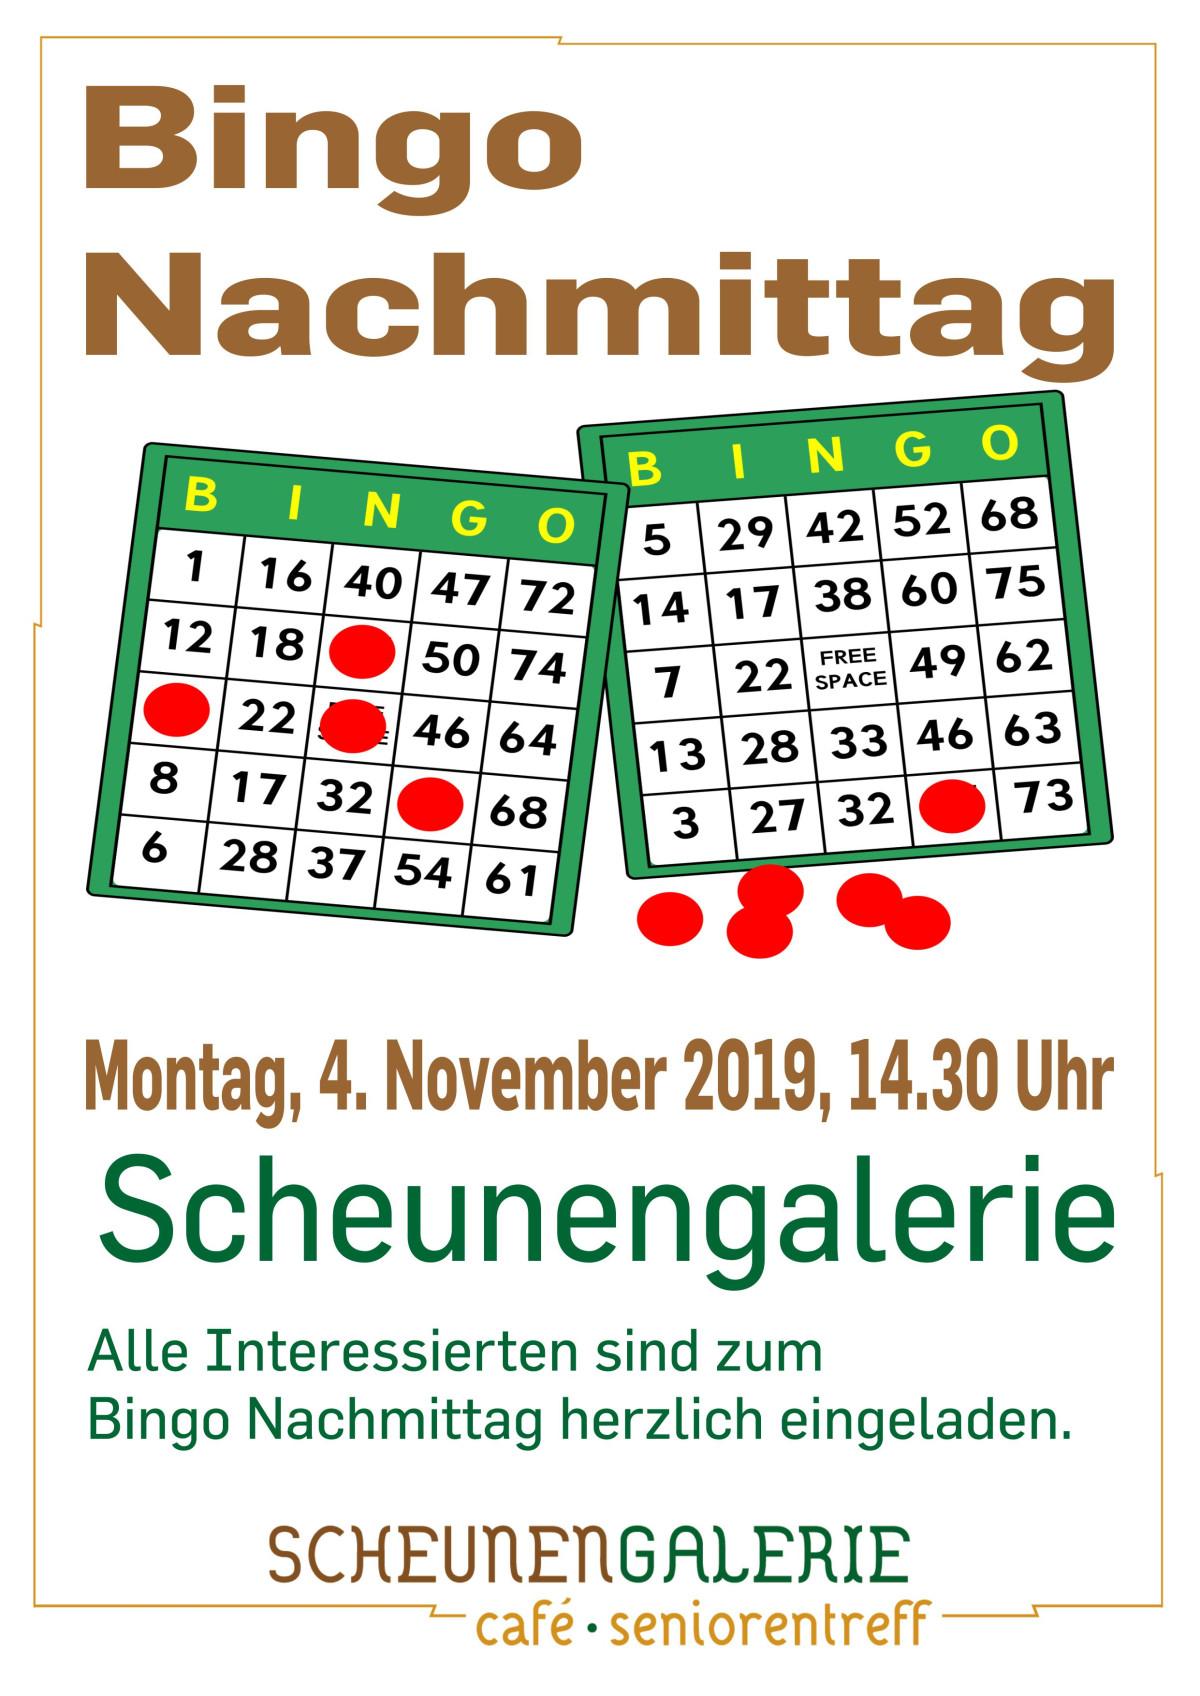 Bingo Nachmittag